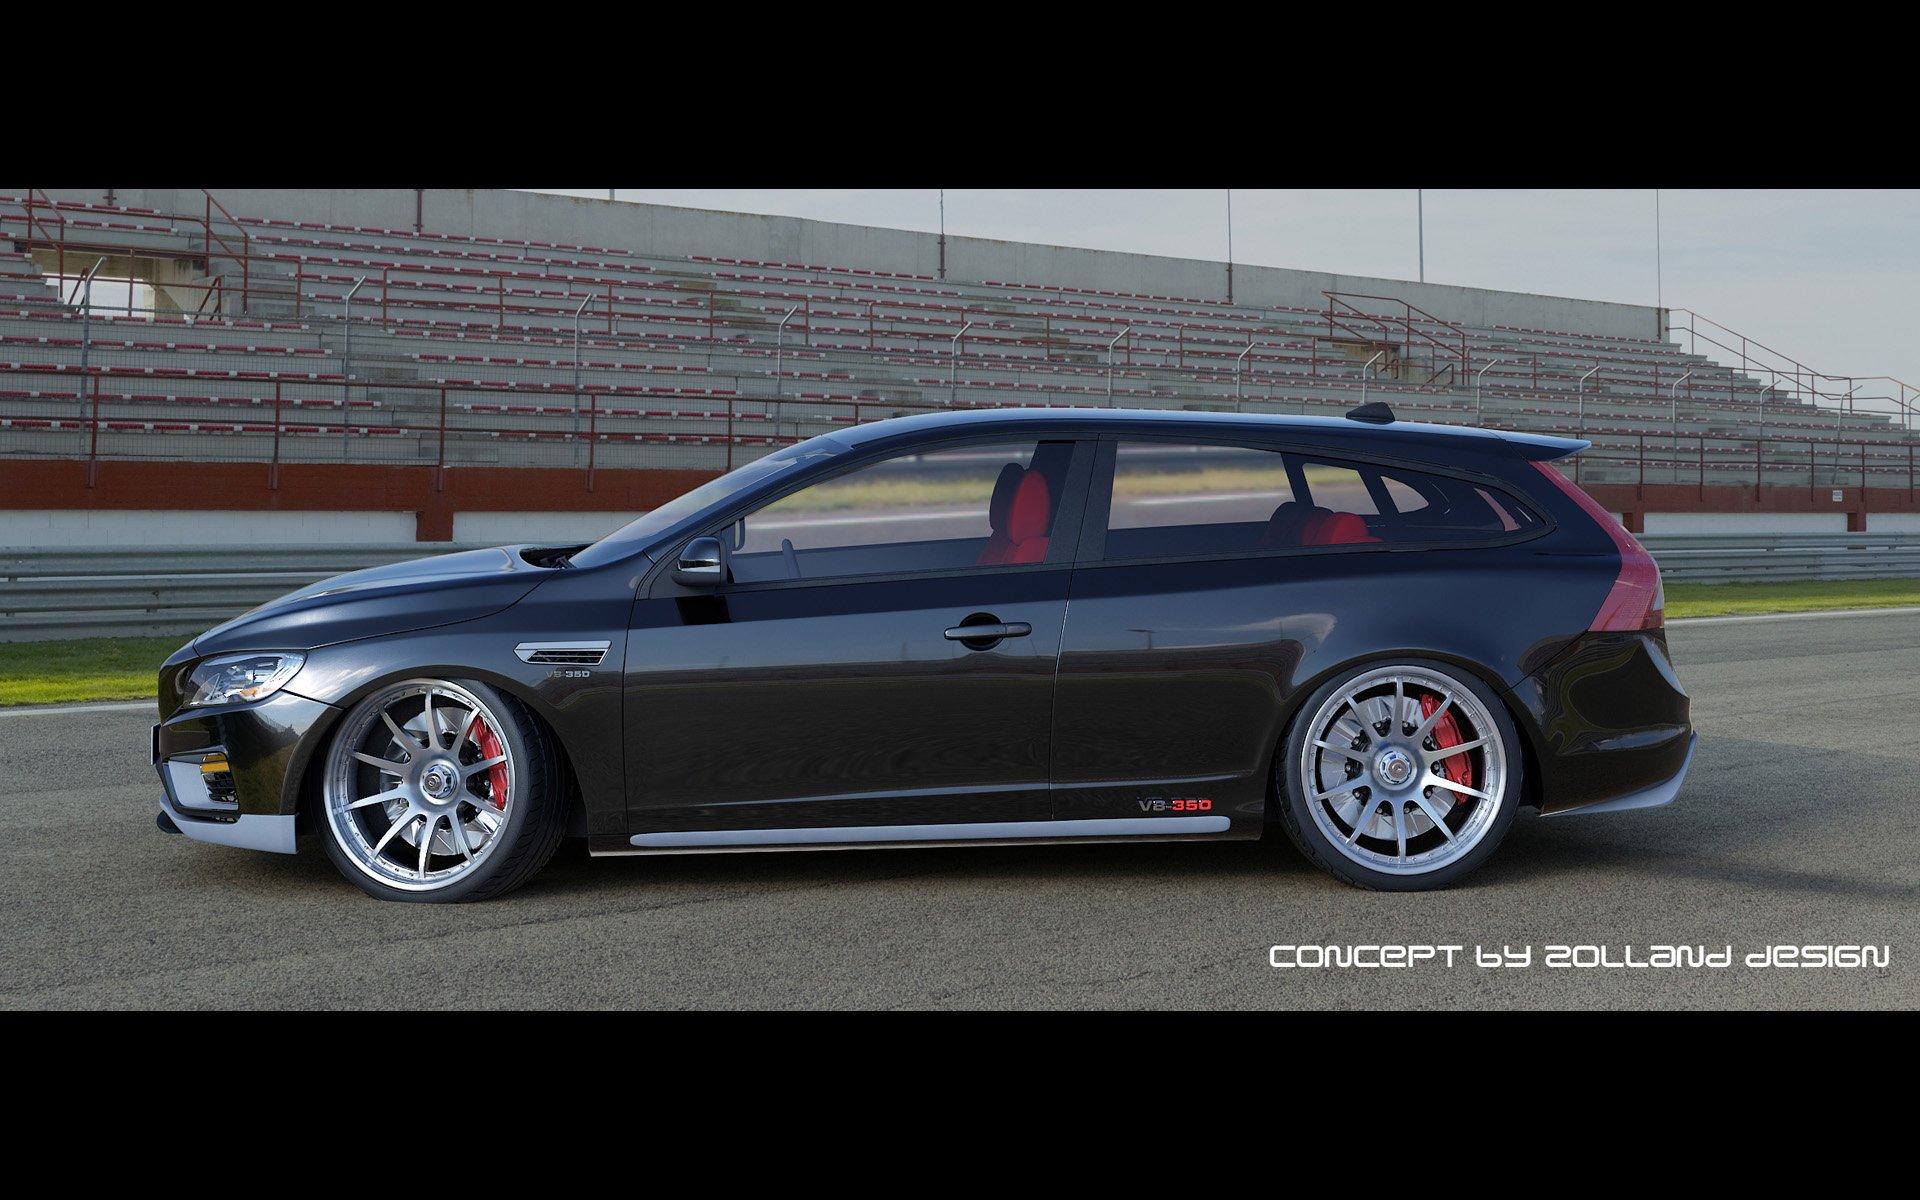 2014 Zolland Design Volvo V60 V 8 2 Door Estate Concept